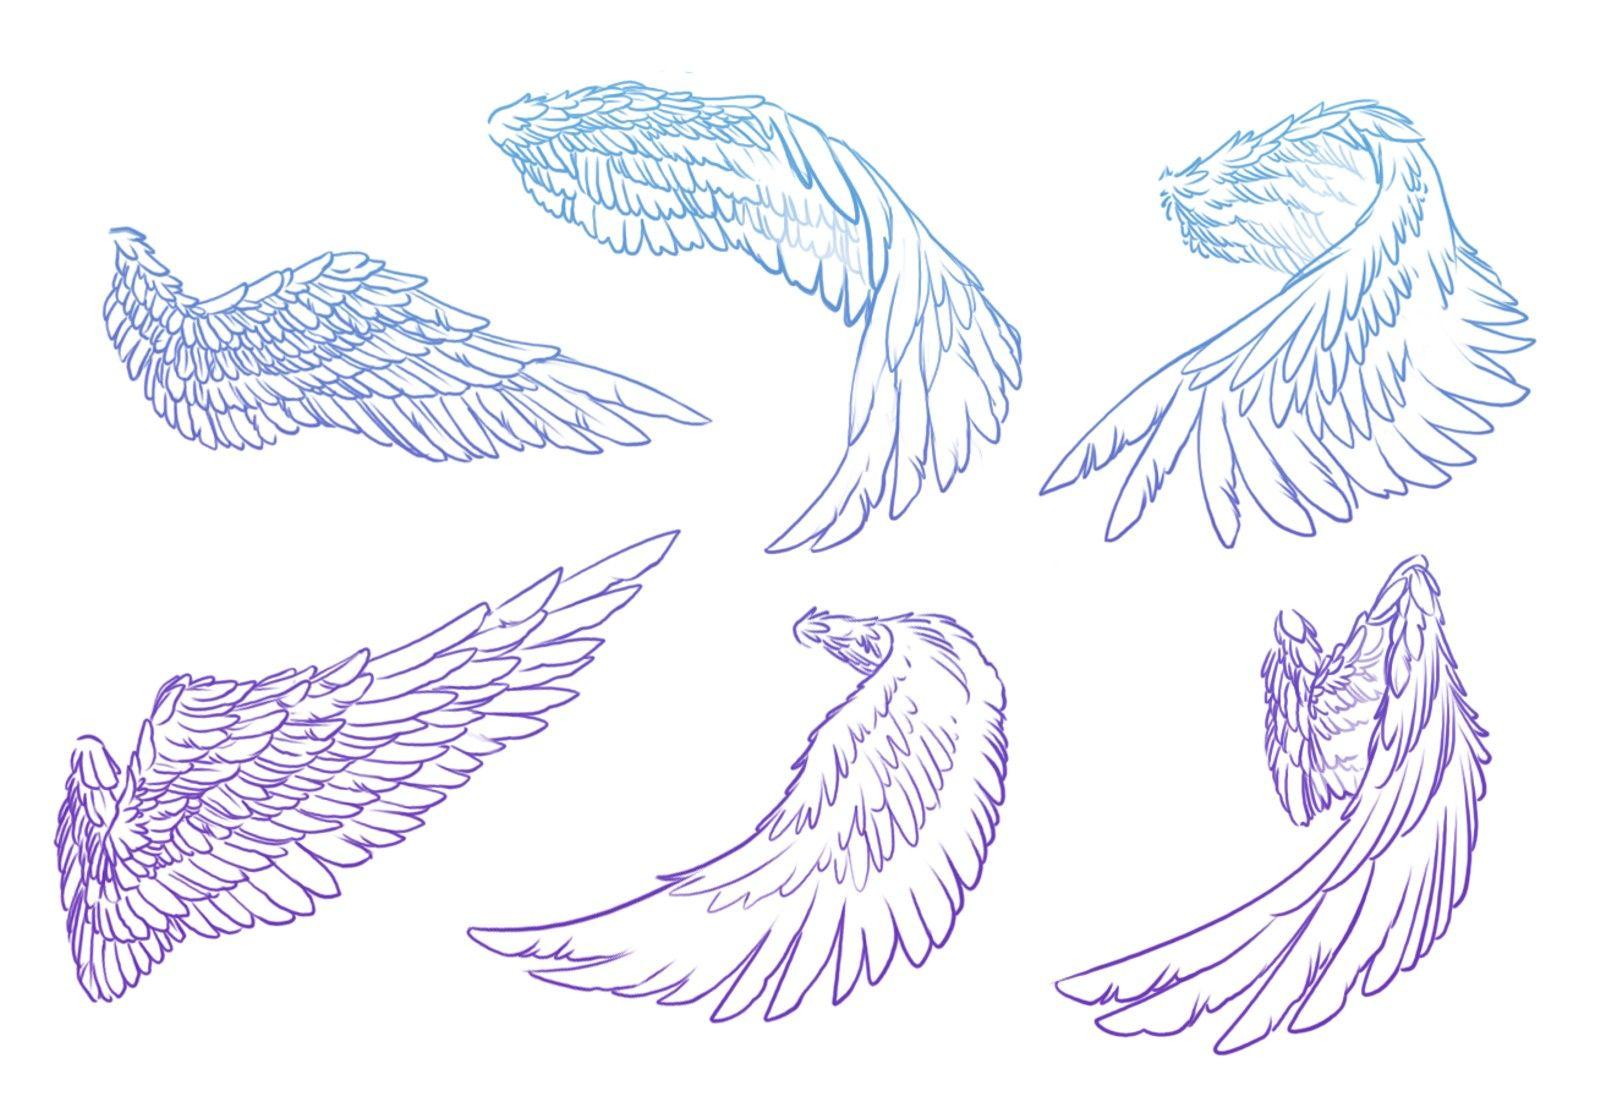 крылья рисунок карандашом этой